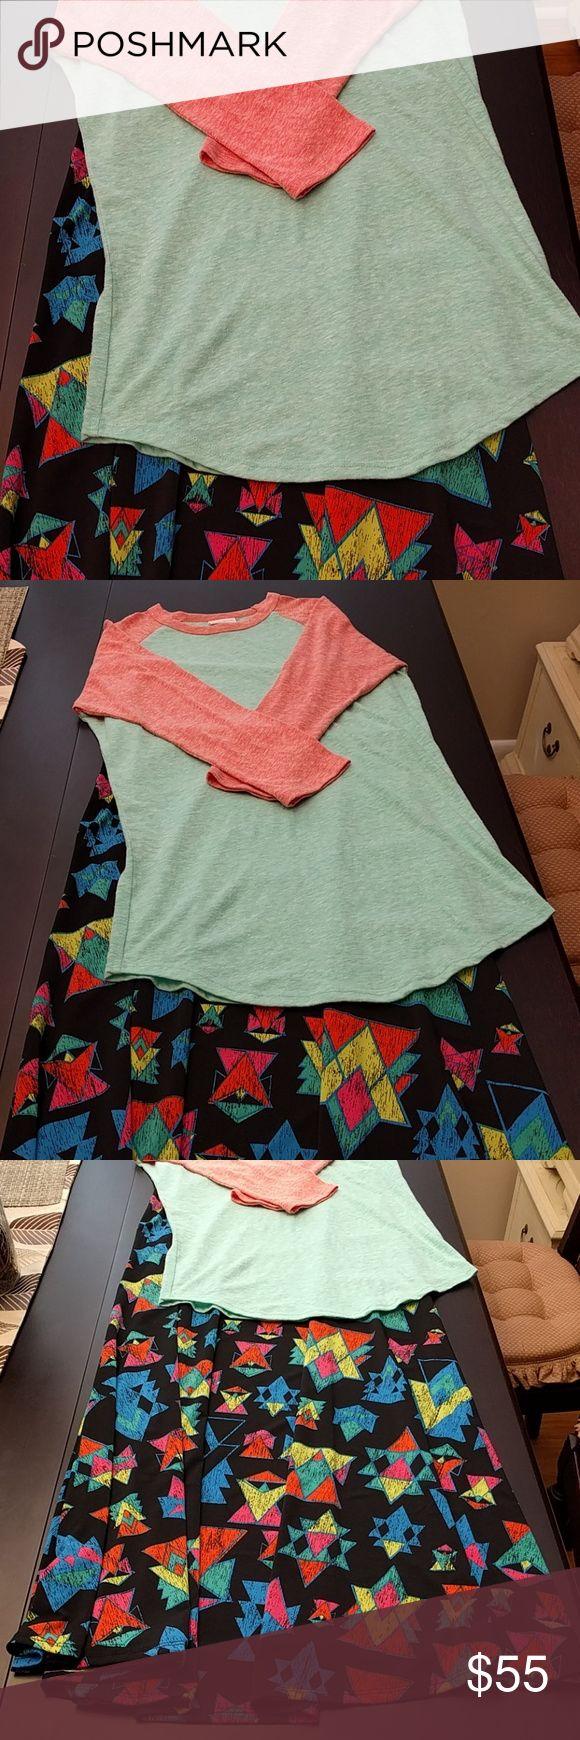 Outfit! XS Maxi & XS Randy NWOT Black background with neon Aztec print XS LuLaRoe Maxi. Matching super soft green and orange XS Randy tee. Brand new. LuLaRoe Skirts Maxi